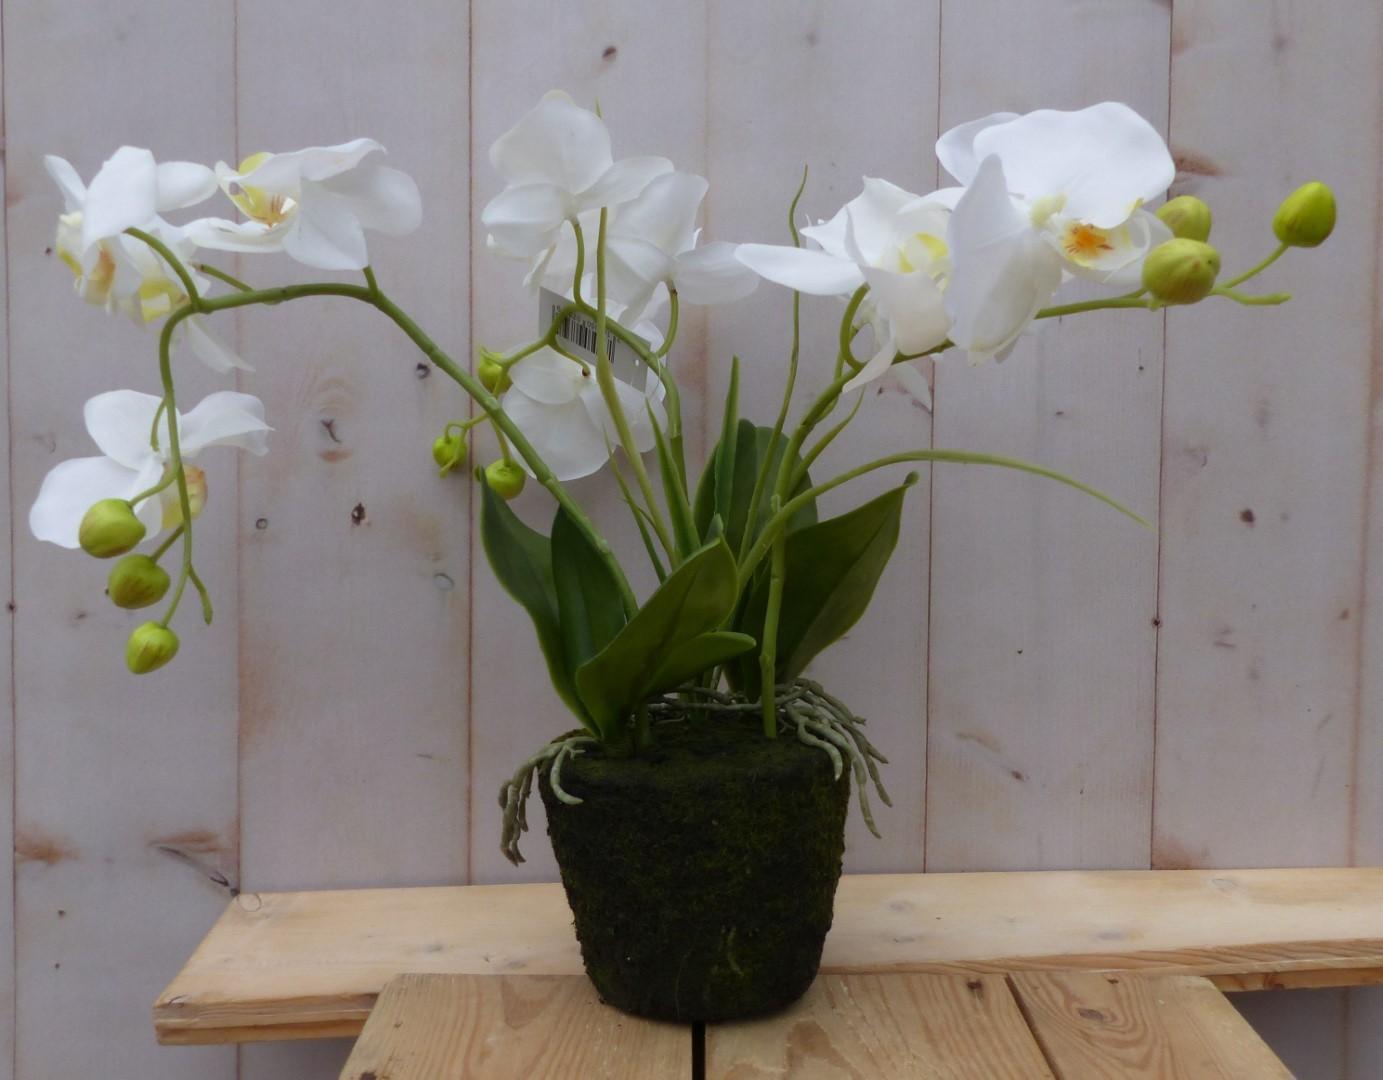 Orchidee phalaenopsis 3 stelen wit 30 cm